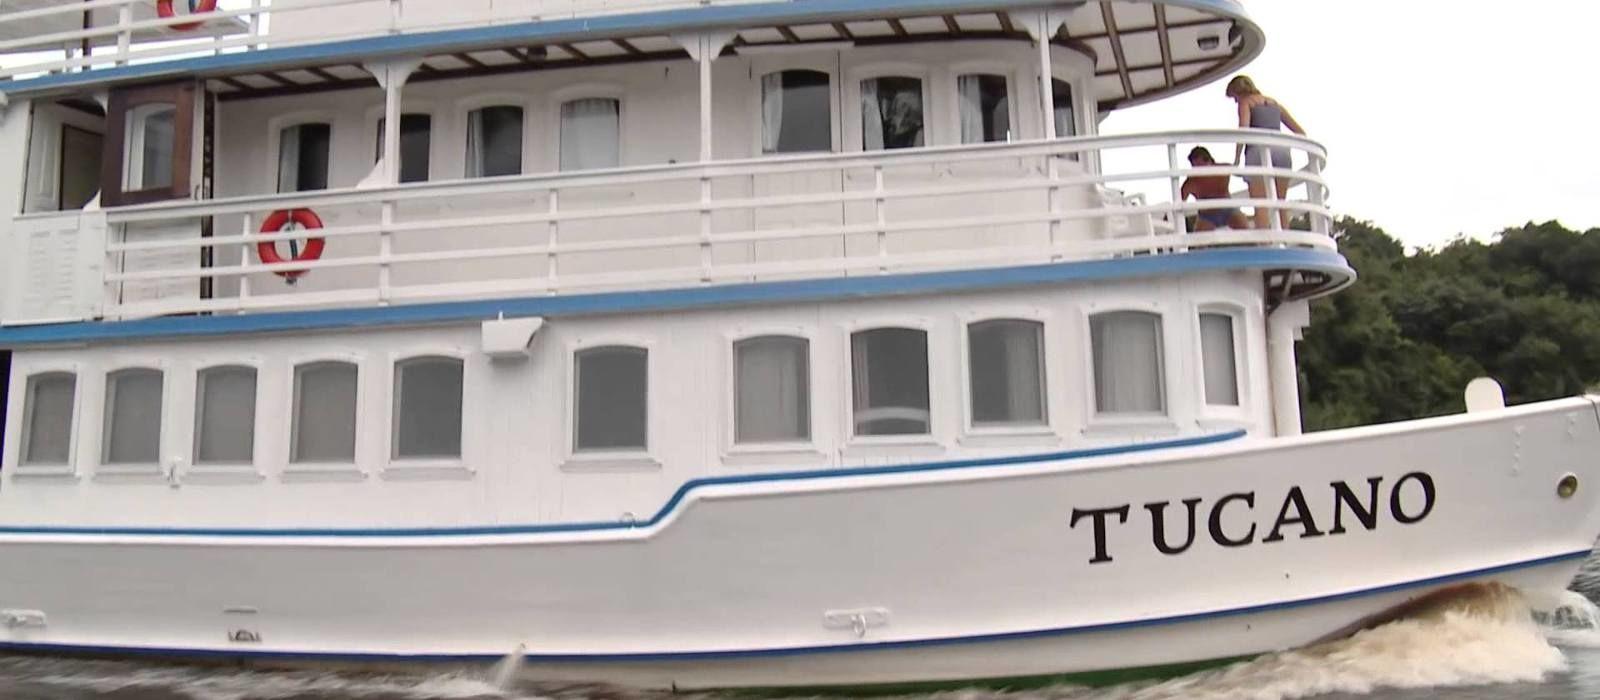 Hotel Motor Yacht Tucano Brazil